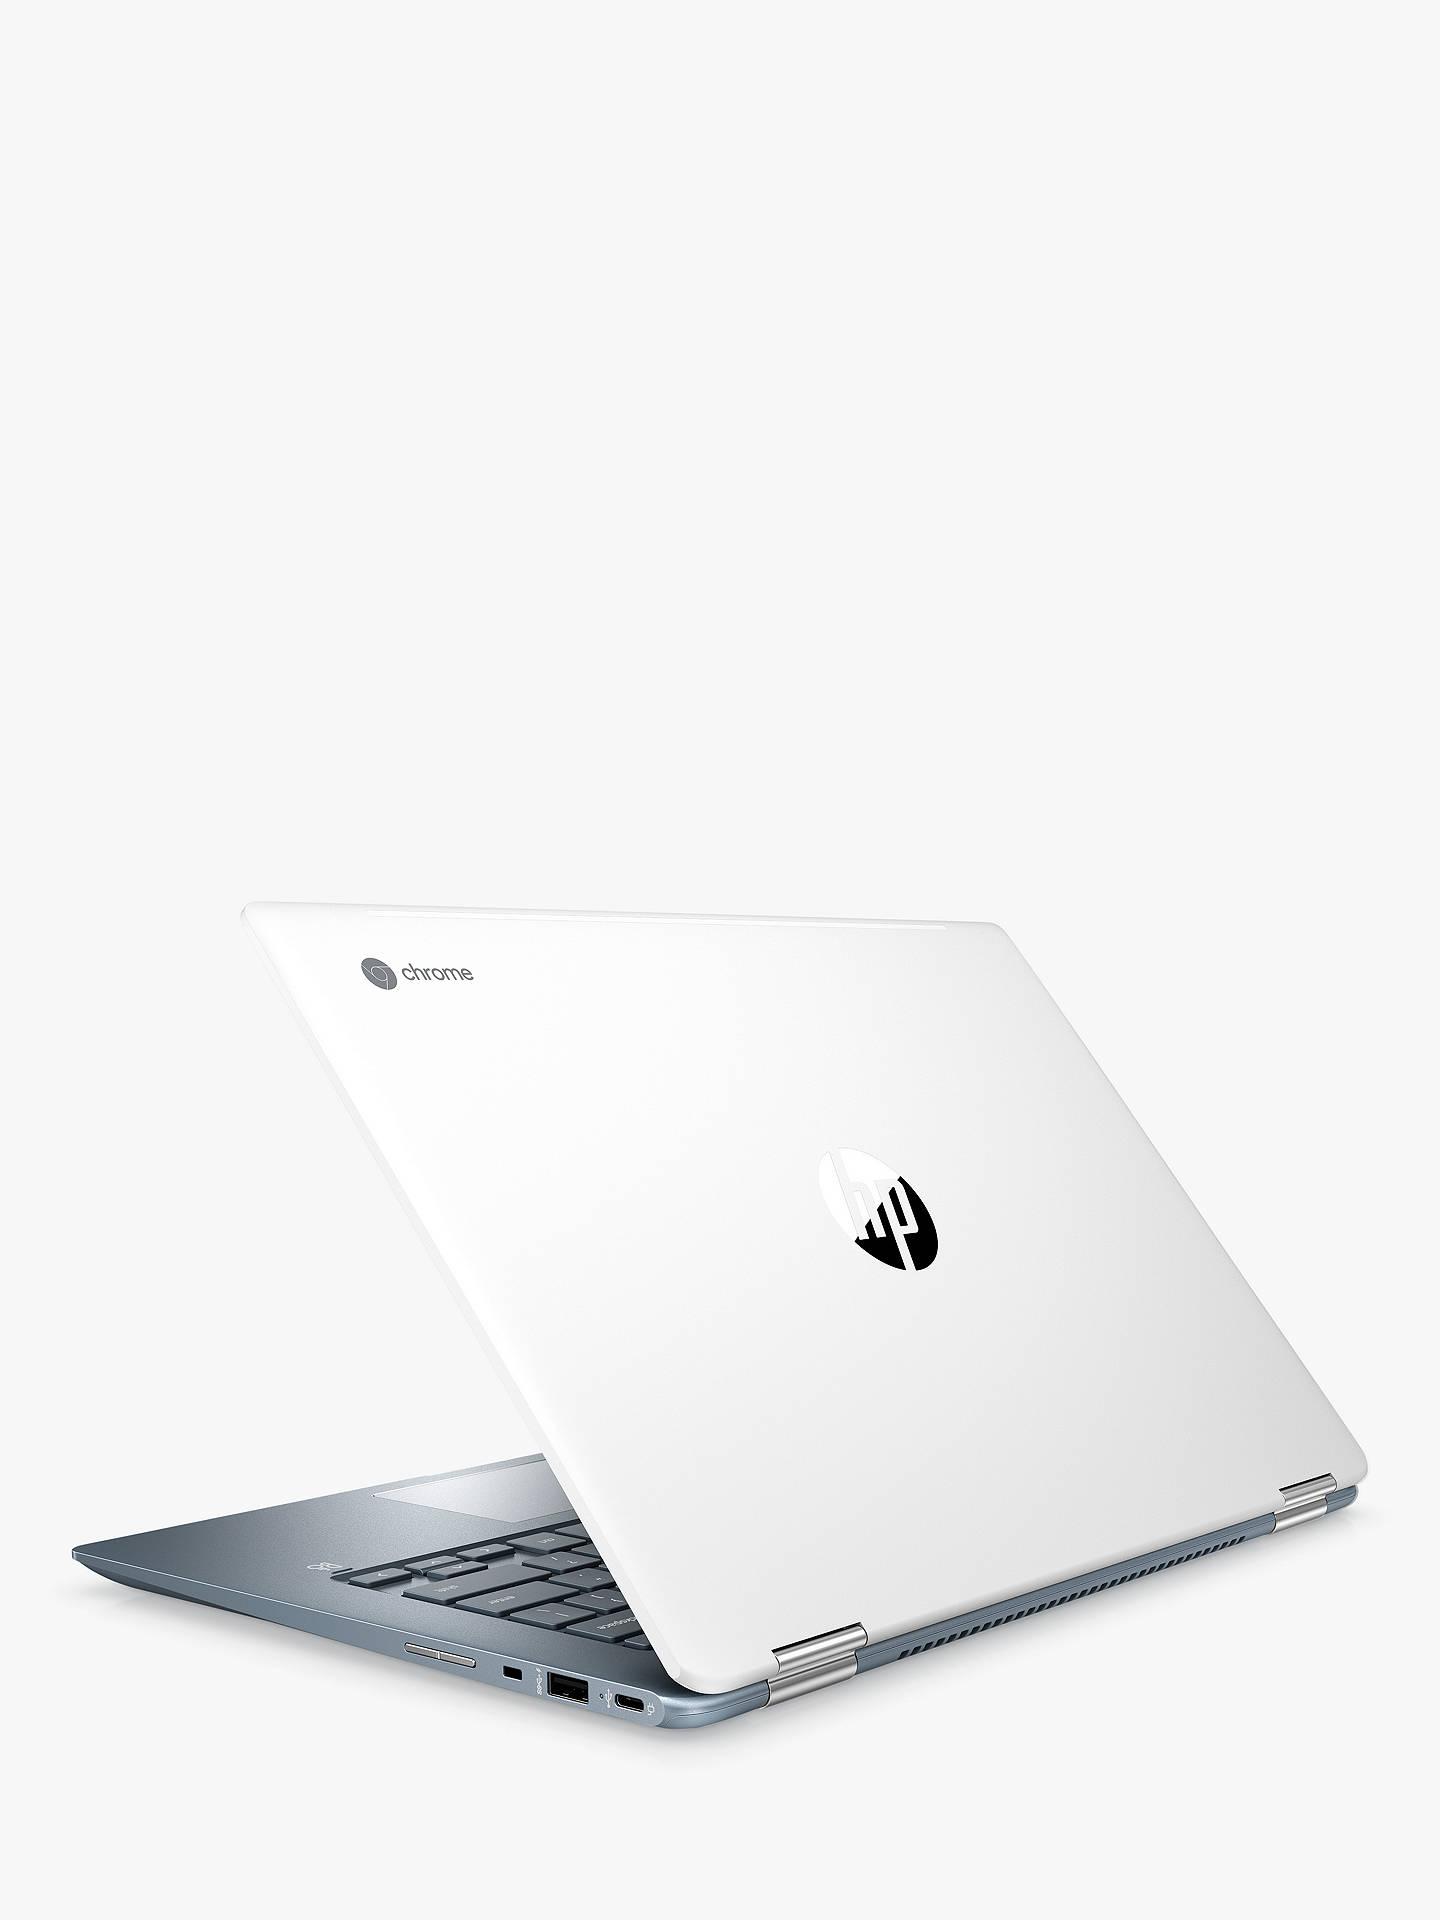 HP x360 Chromebook, Intel Core i3, 8GB RAM, 64GB eMMC, 14